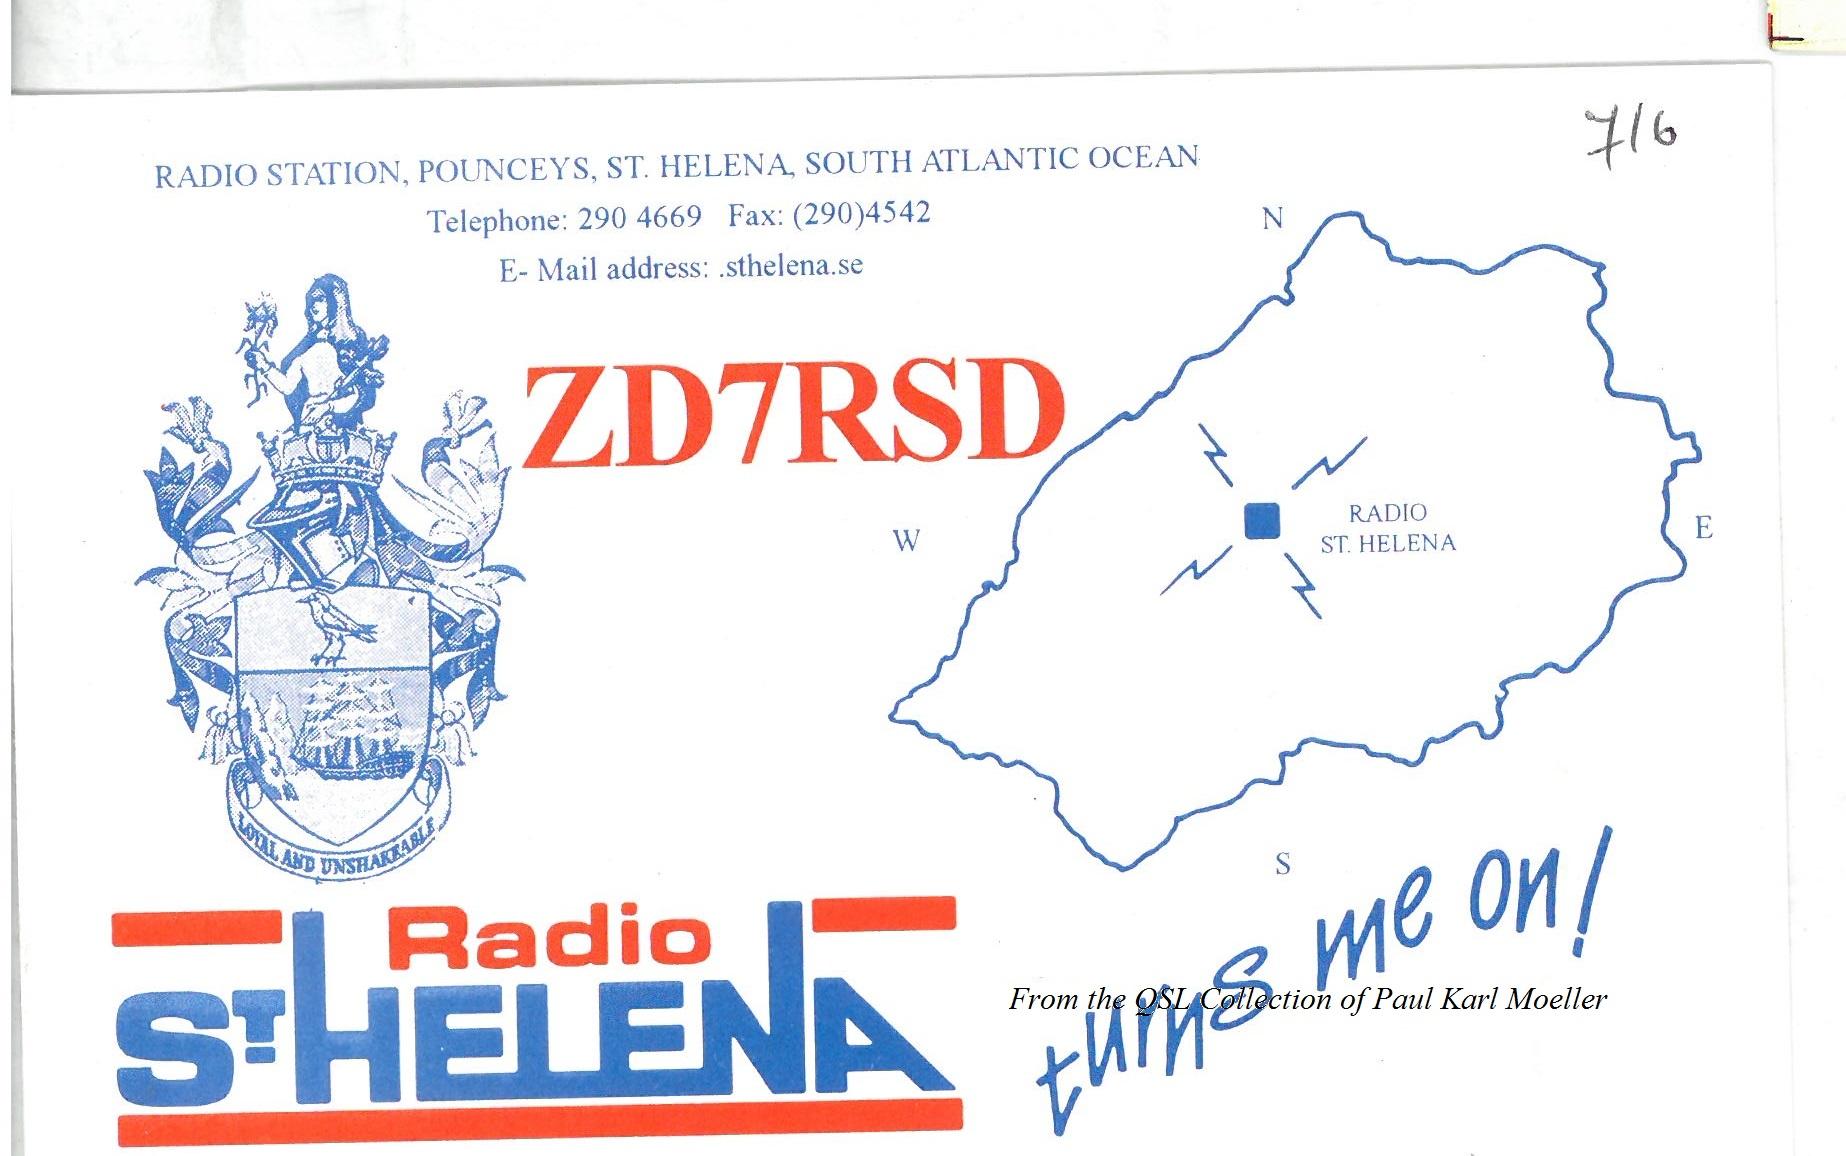 Radio St. Helena QSL